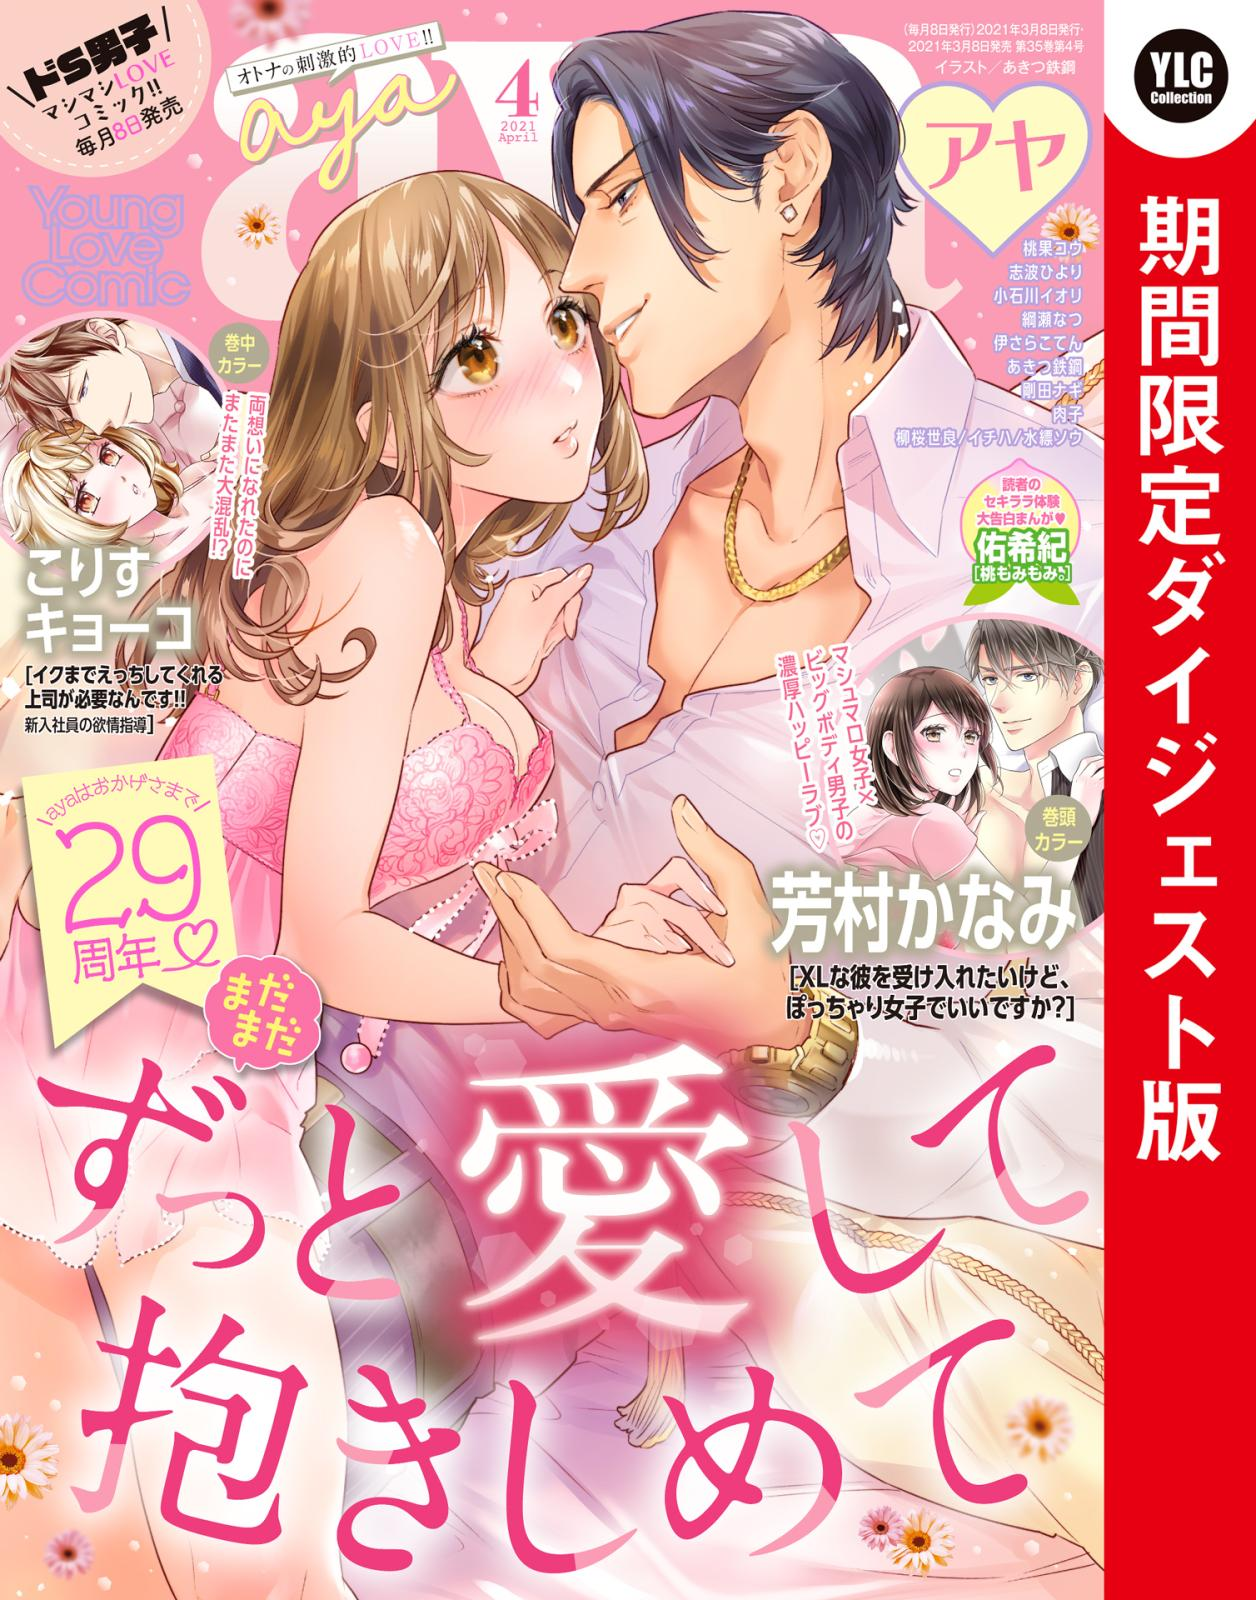 Young Love Comic aya2021年4月号 ダイジェスト版